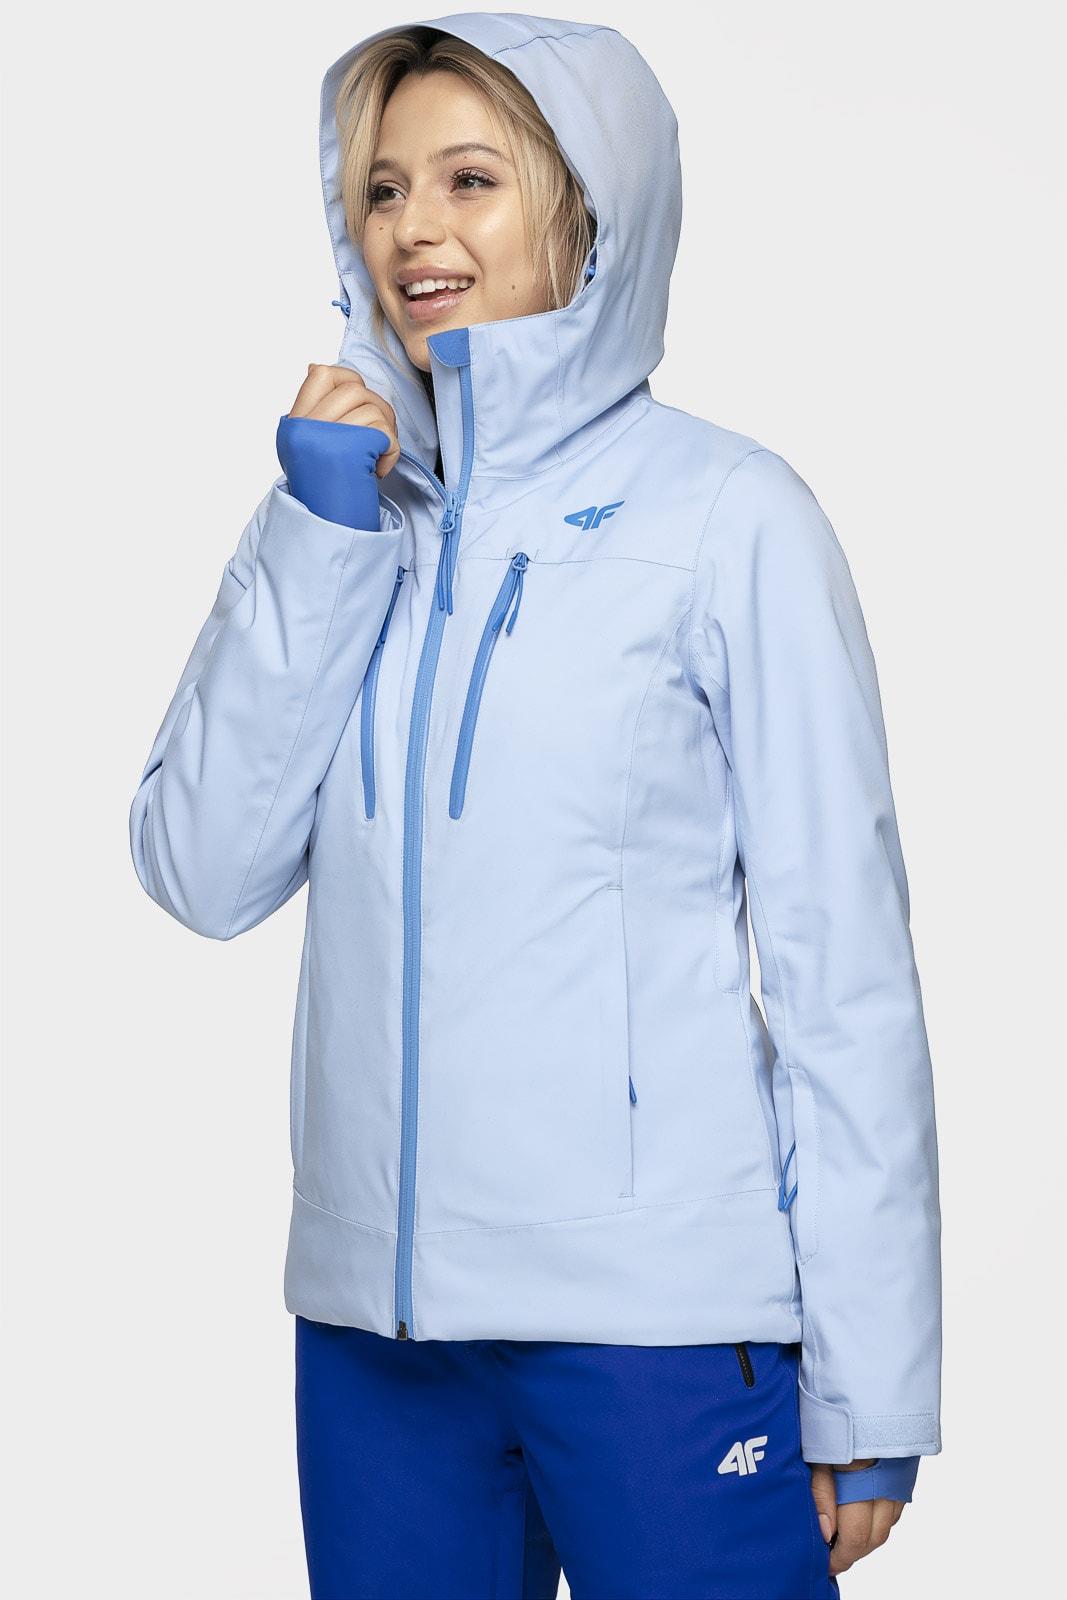 Kurtka narciarska damska KUDN251A - jasny niebieski